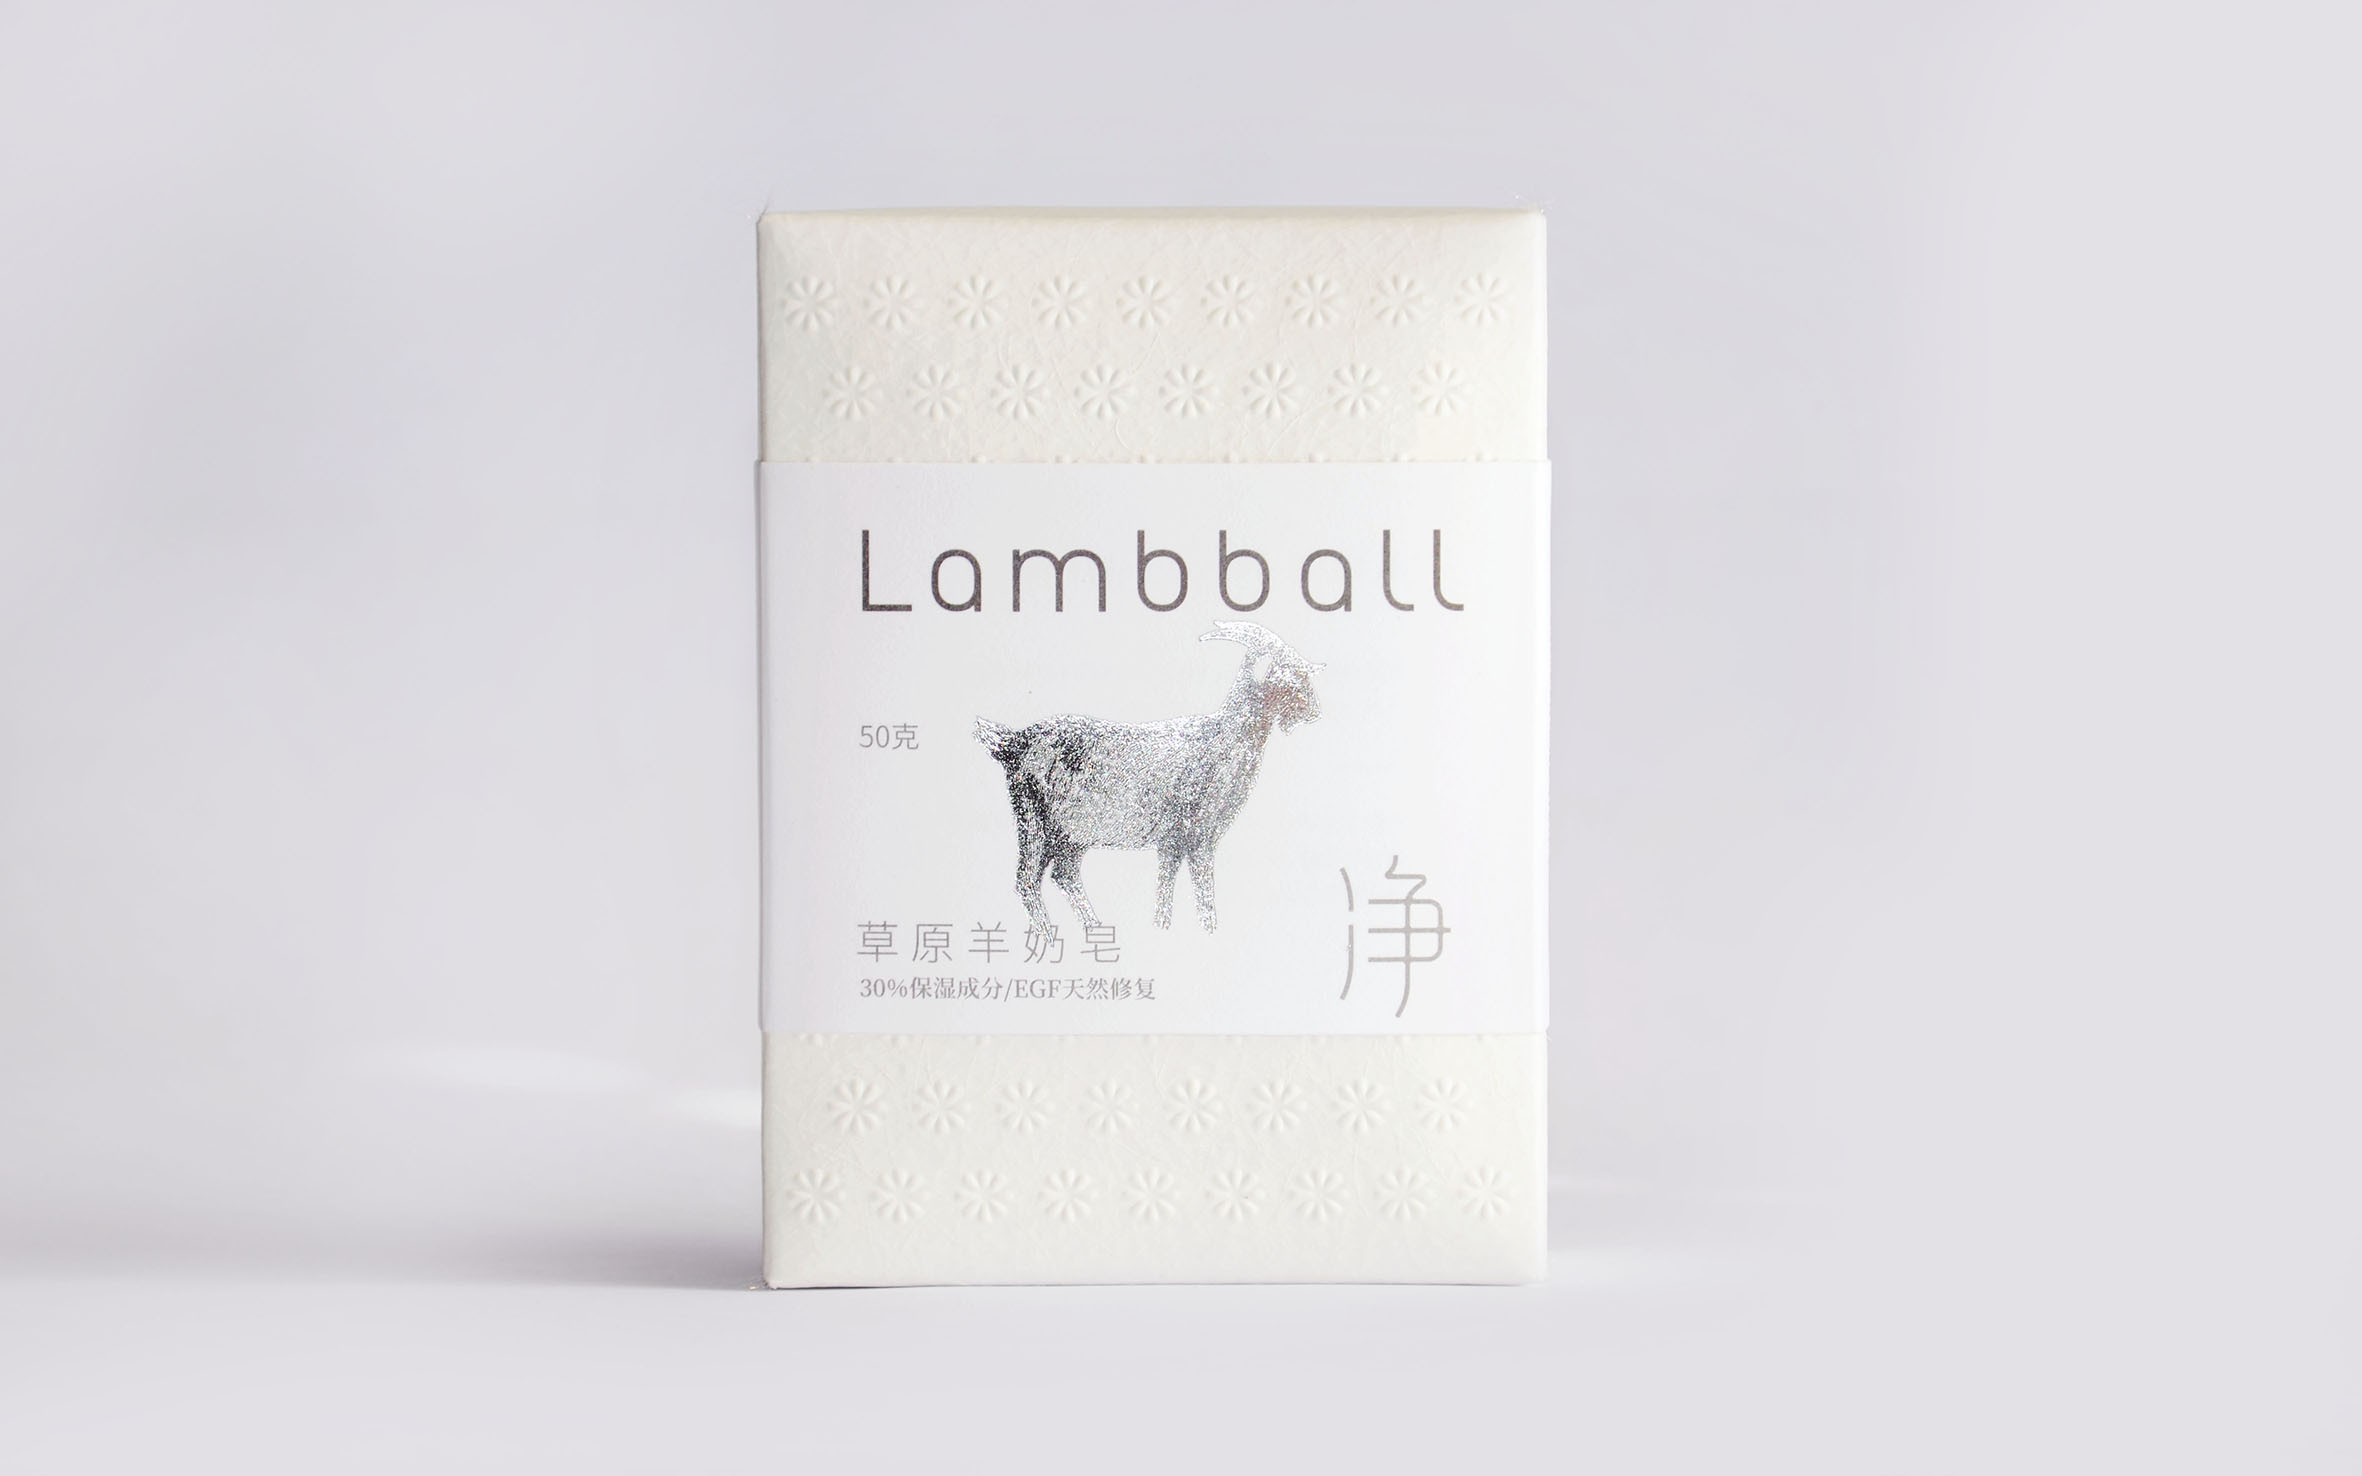 lambball羊奶皂包装设计 第2张 lambball羊奶皂包装设计 蒙古设计